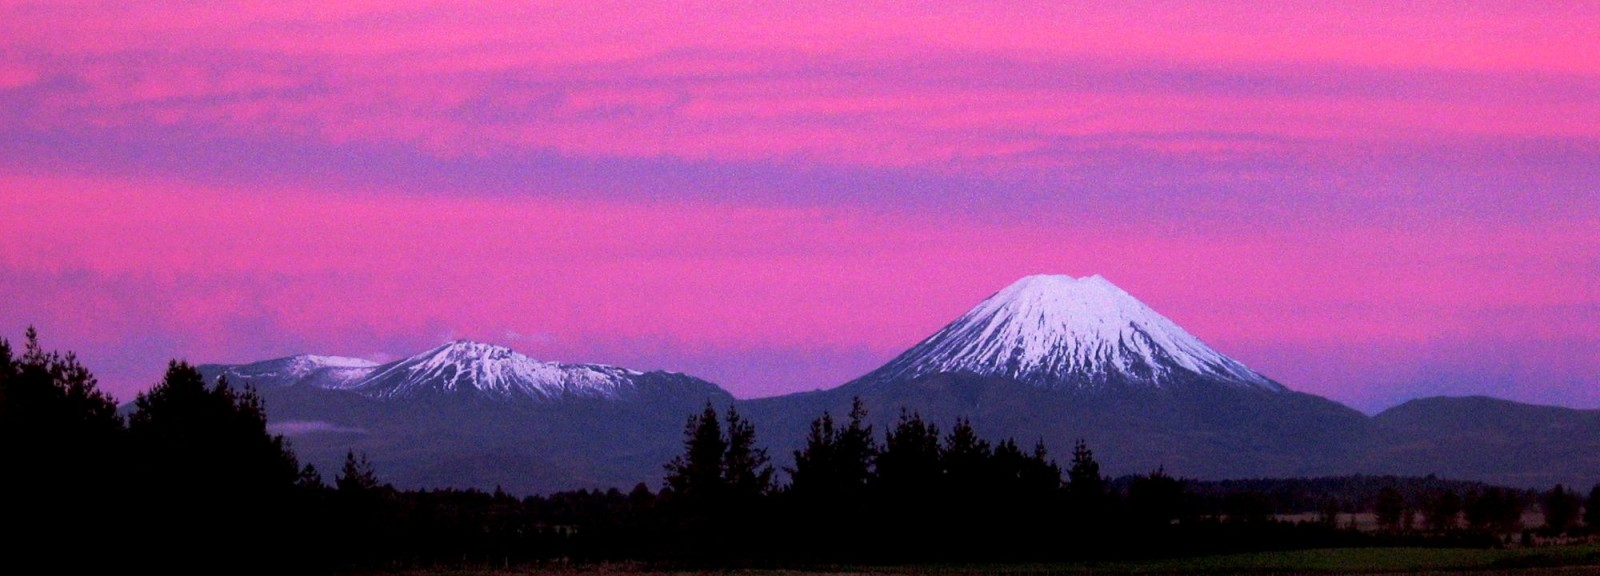 sunset-1600x576